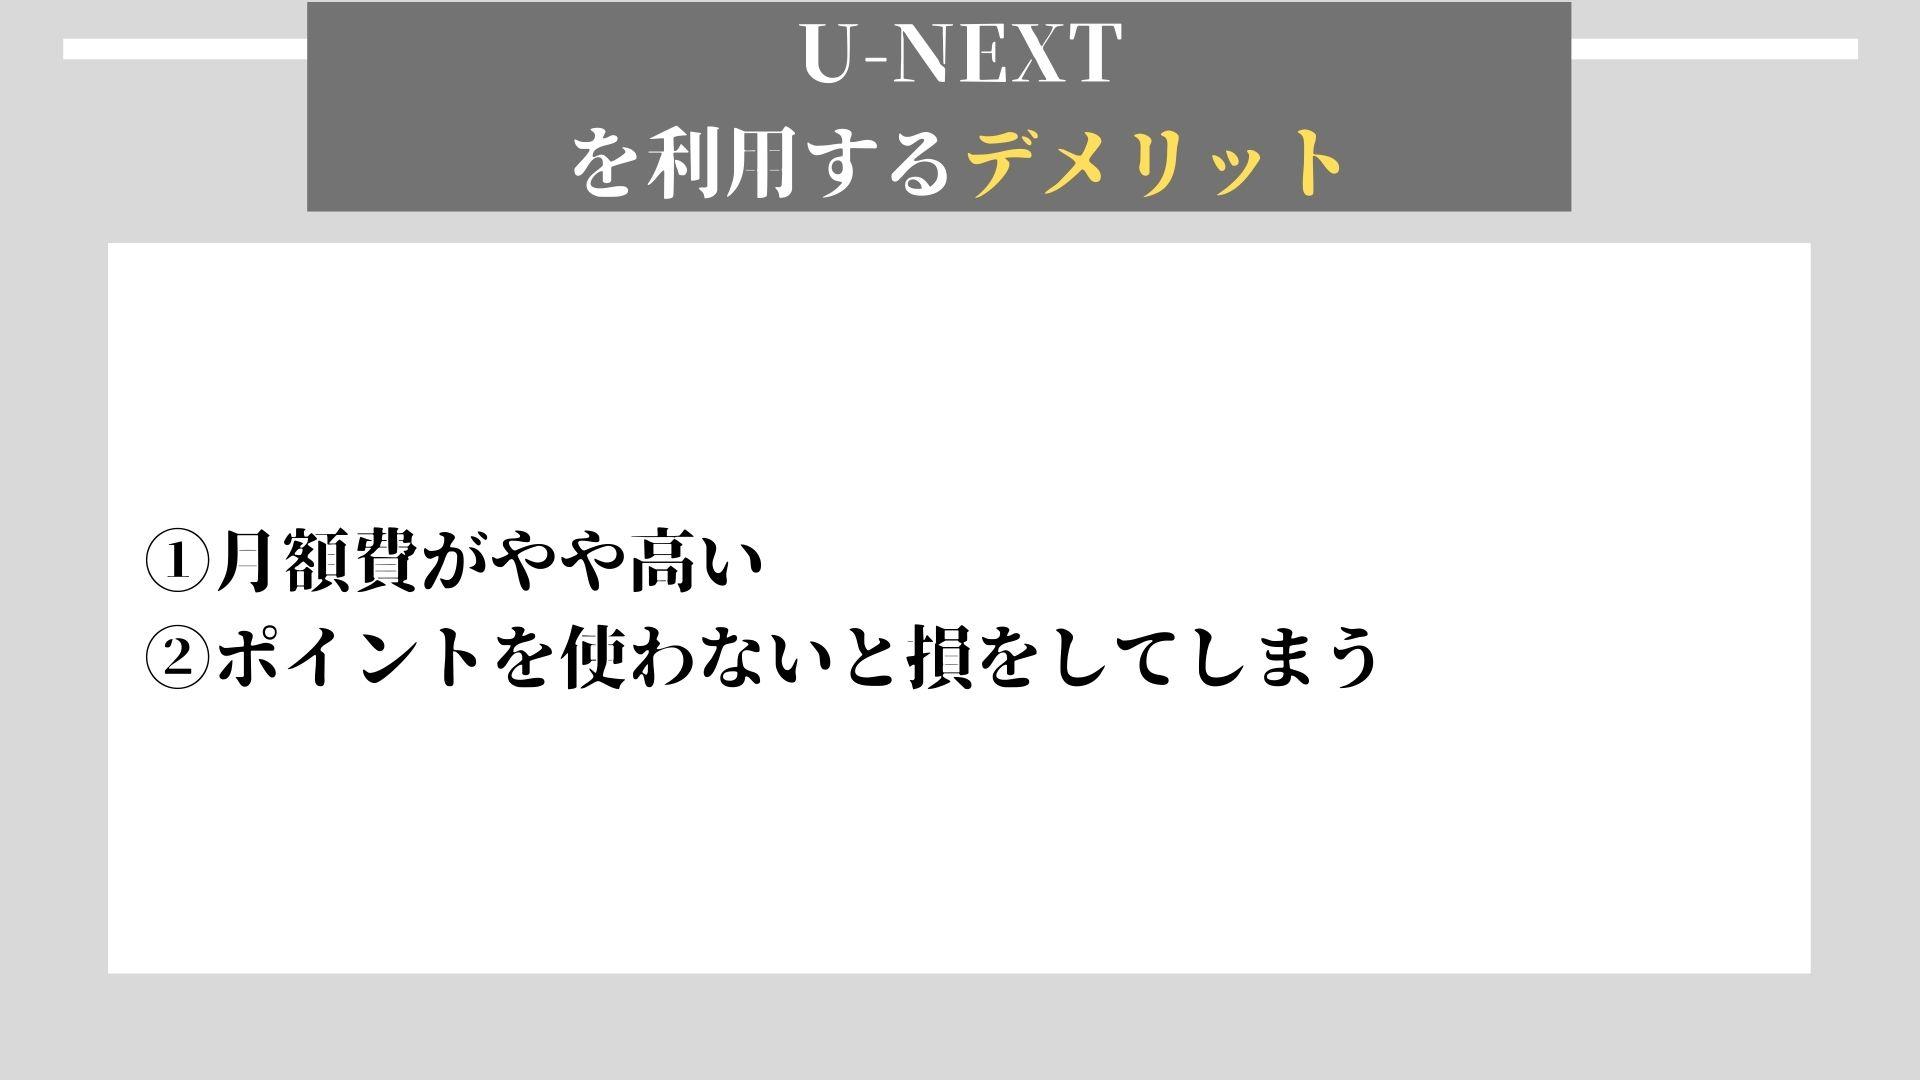 U-NEXT デメリット